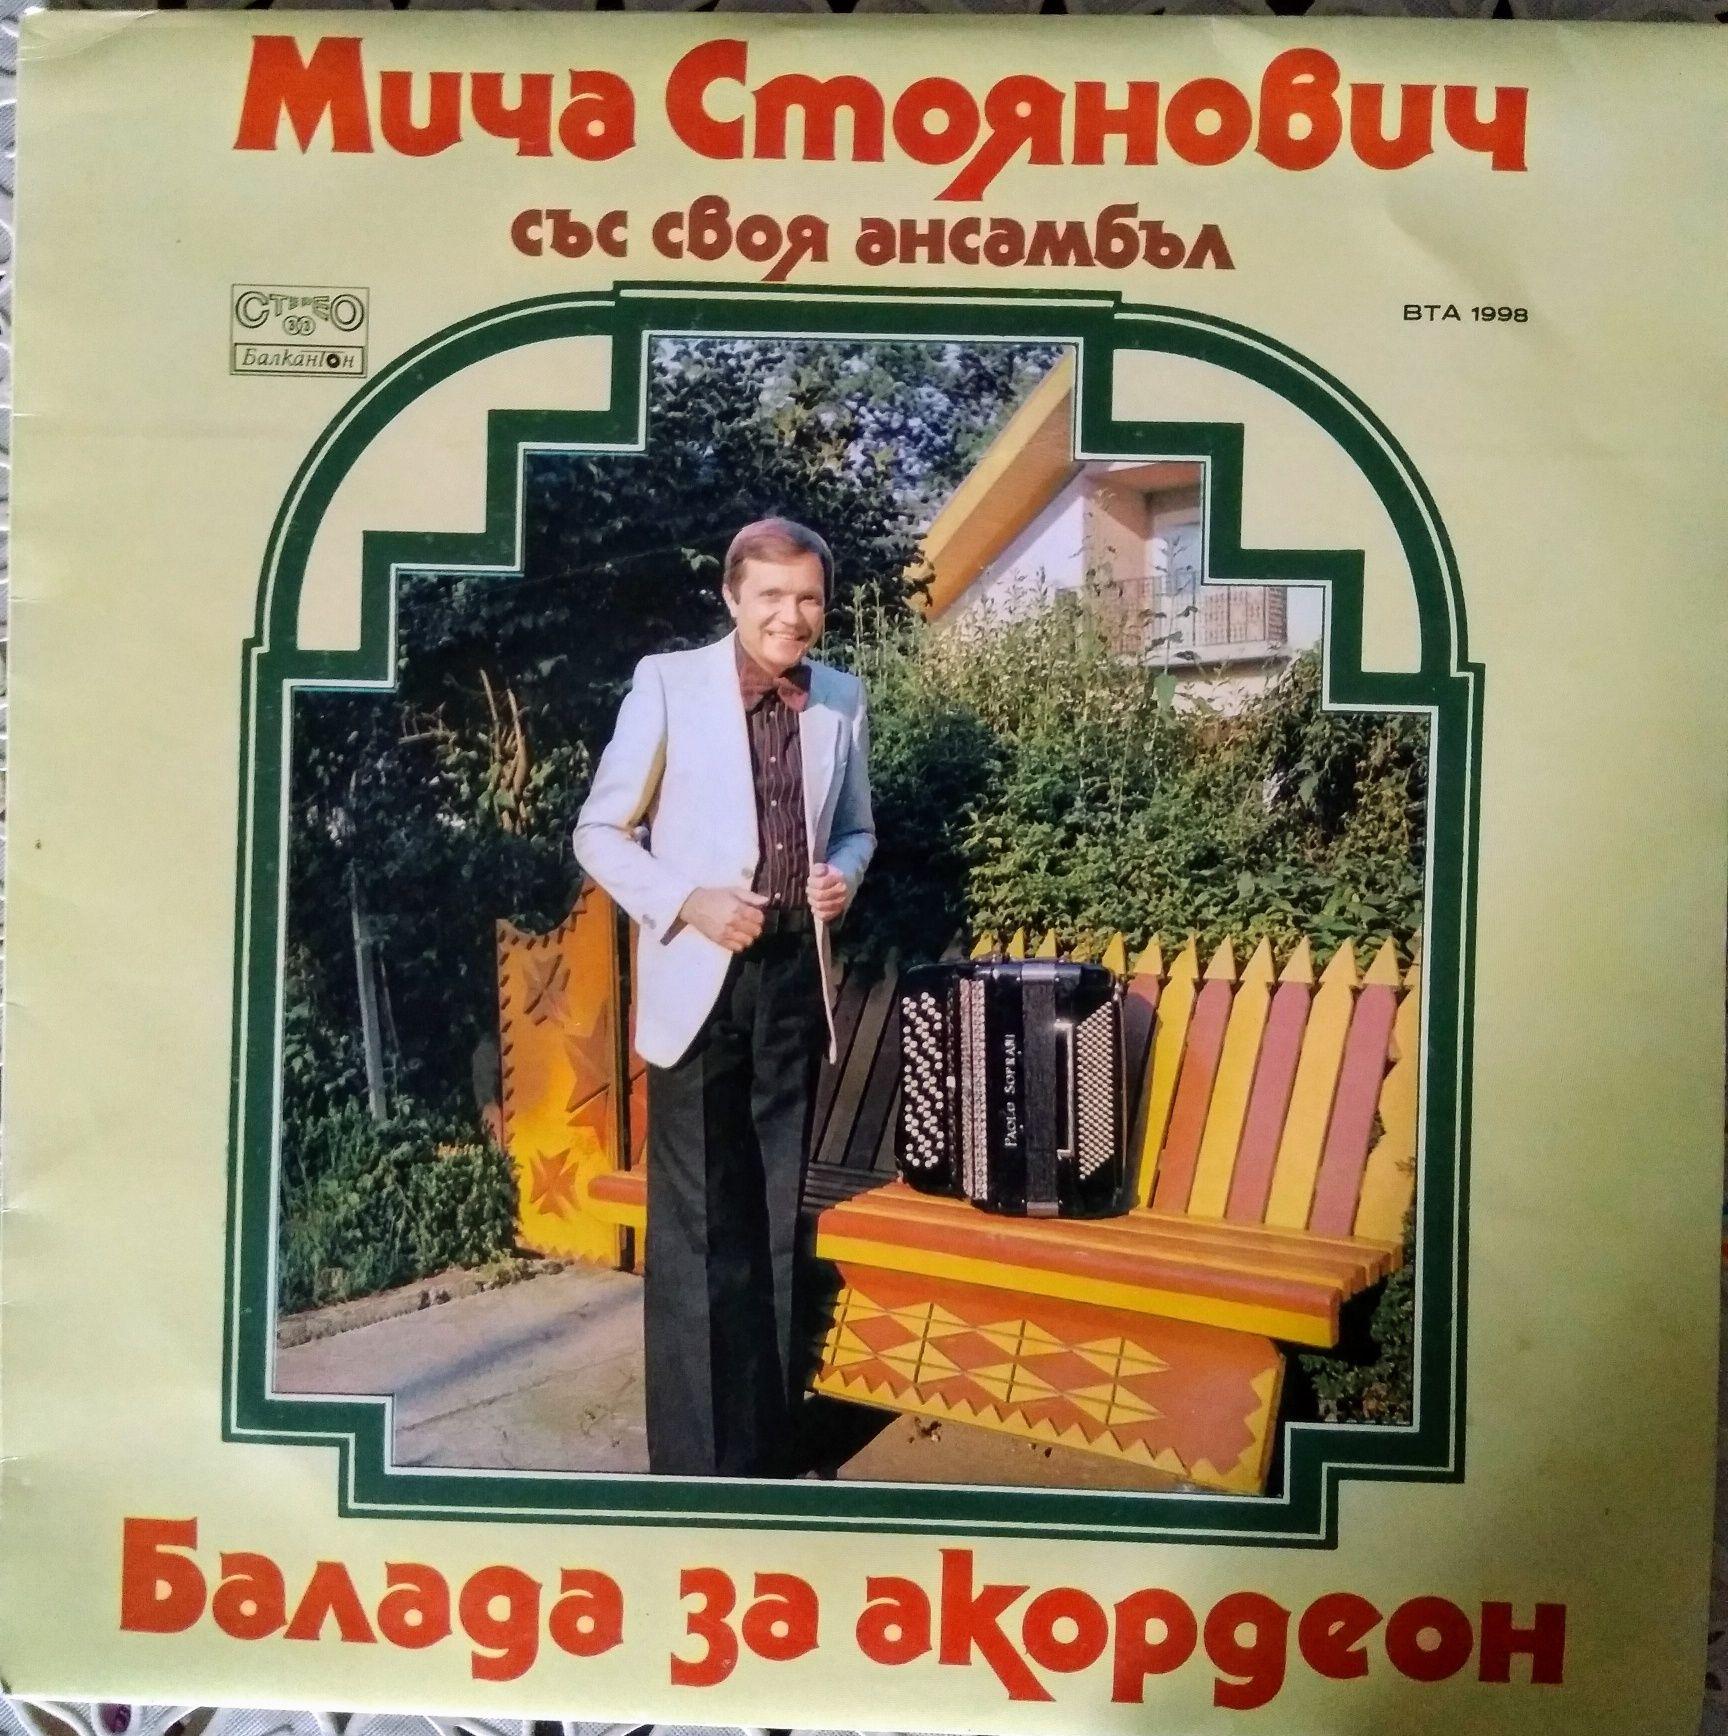 Грамофонни плочи- Сигнал,Мича Стоянович ...